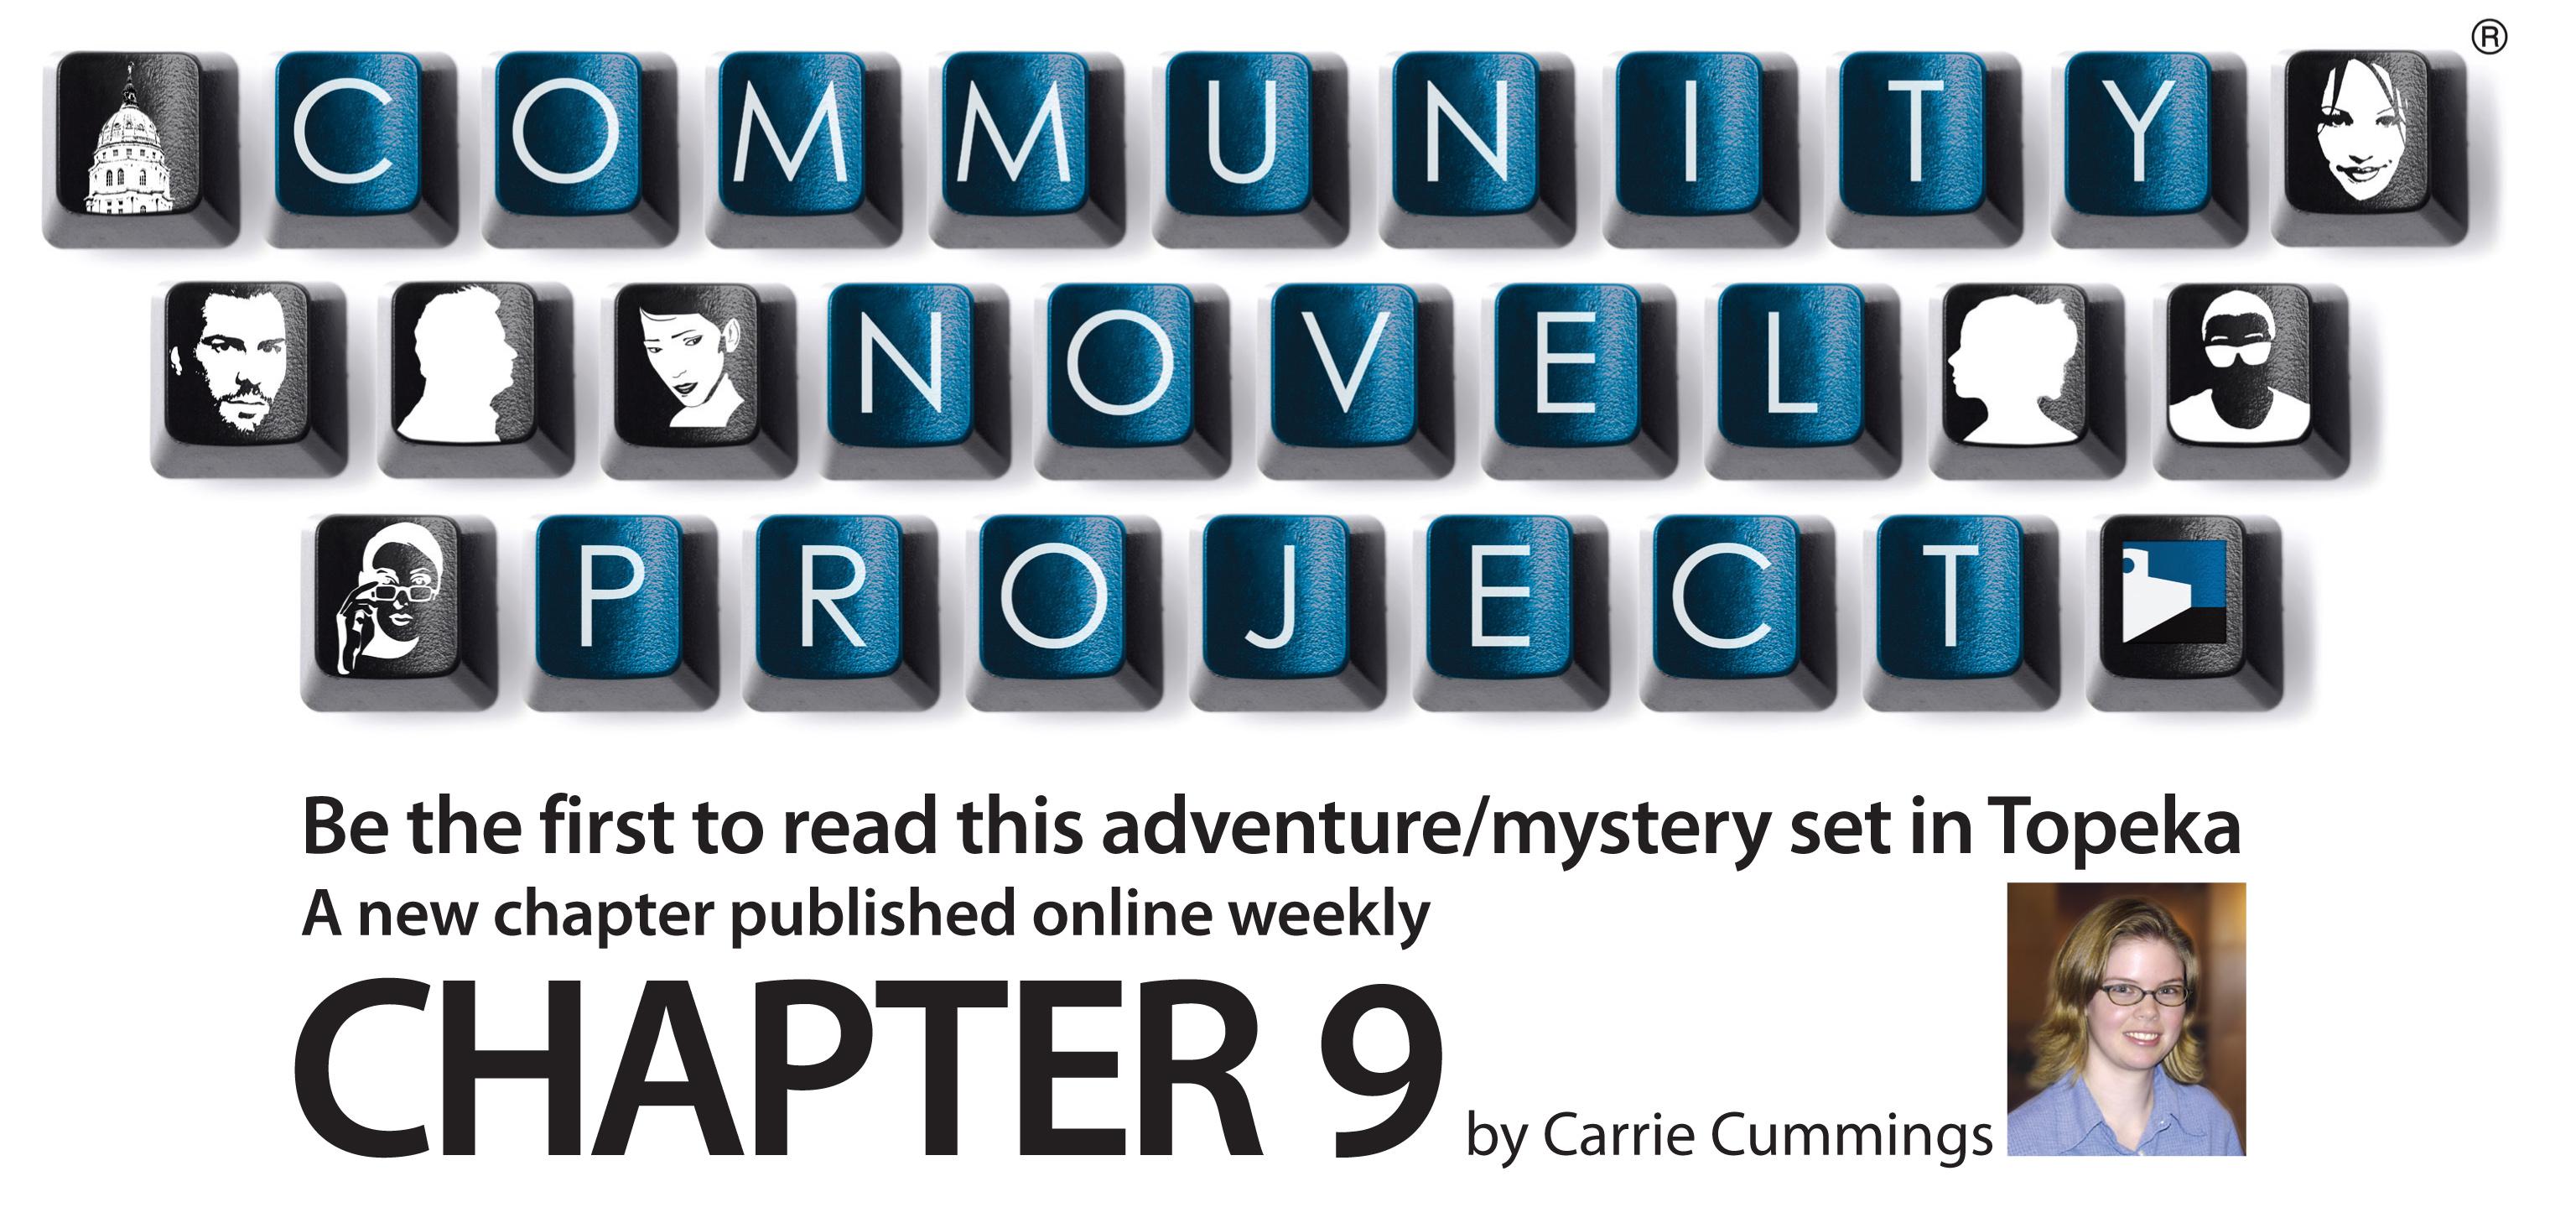 community novel chapter 9